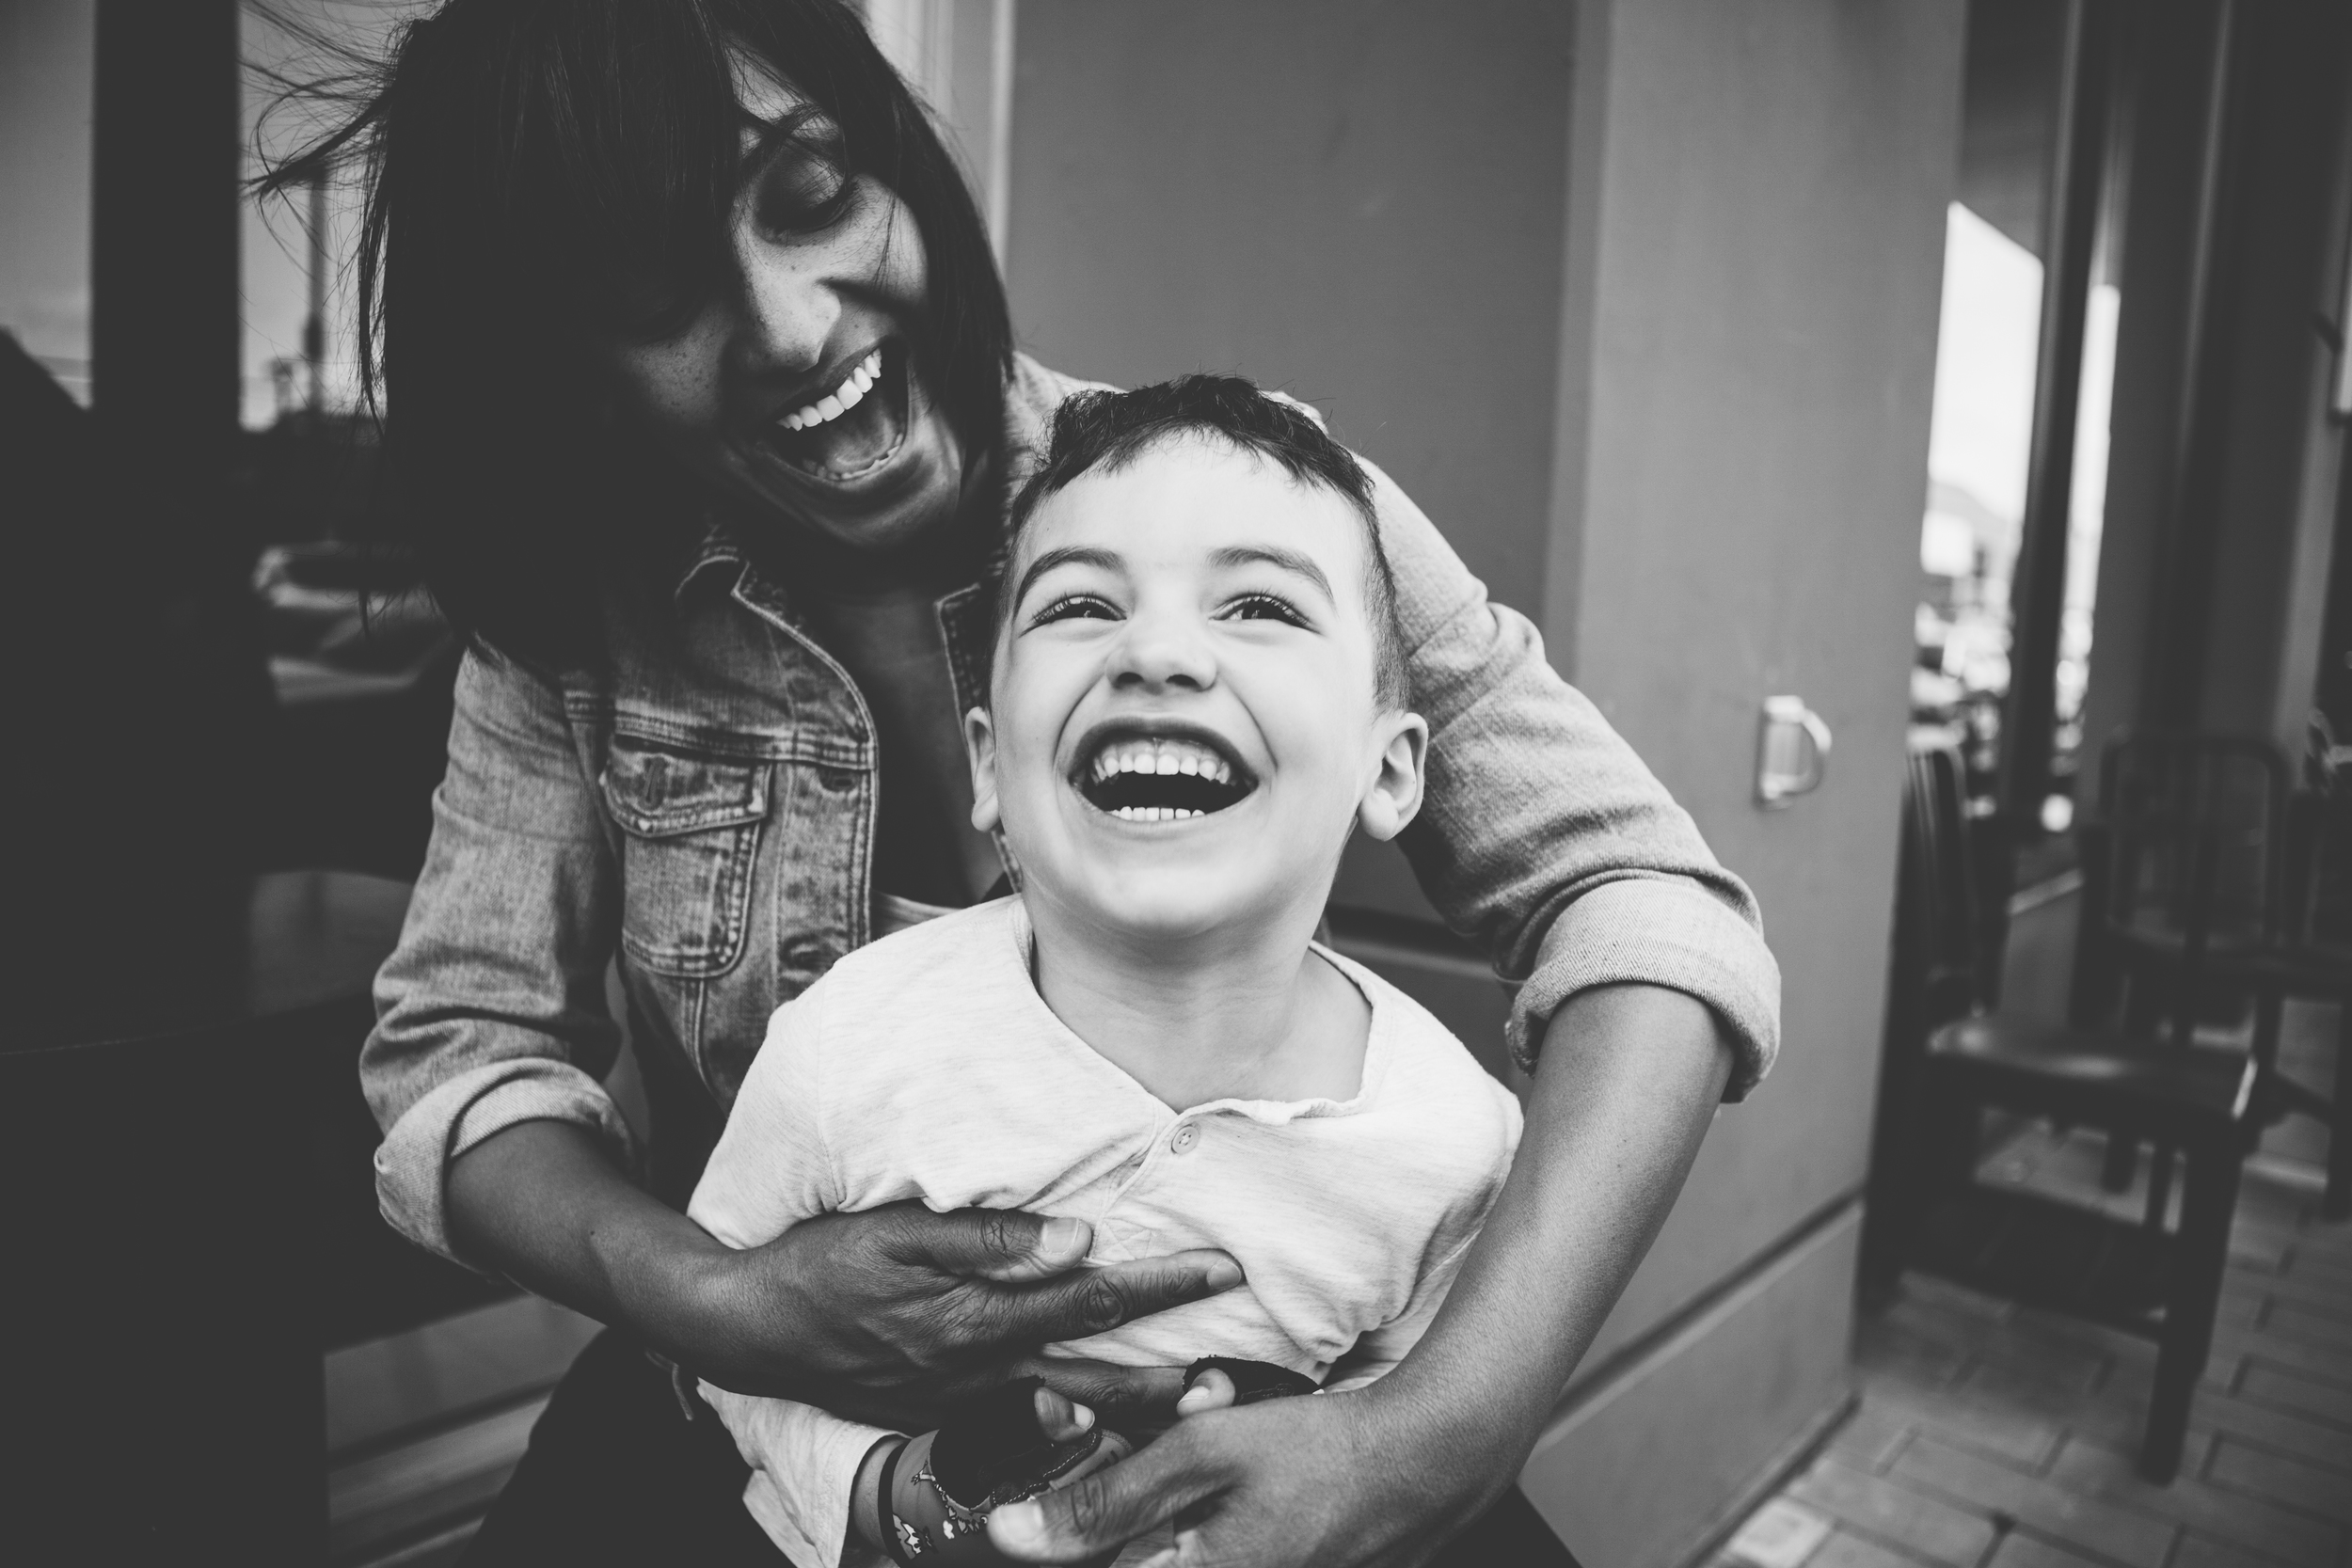 vancouverfamilyphotographer-17.jpg